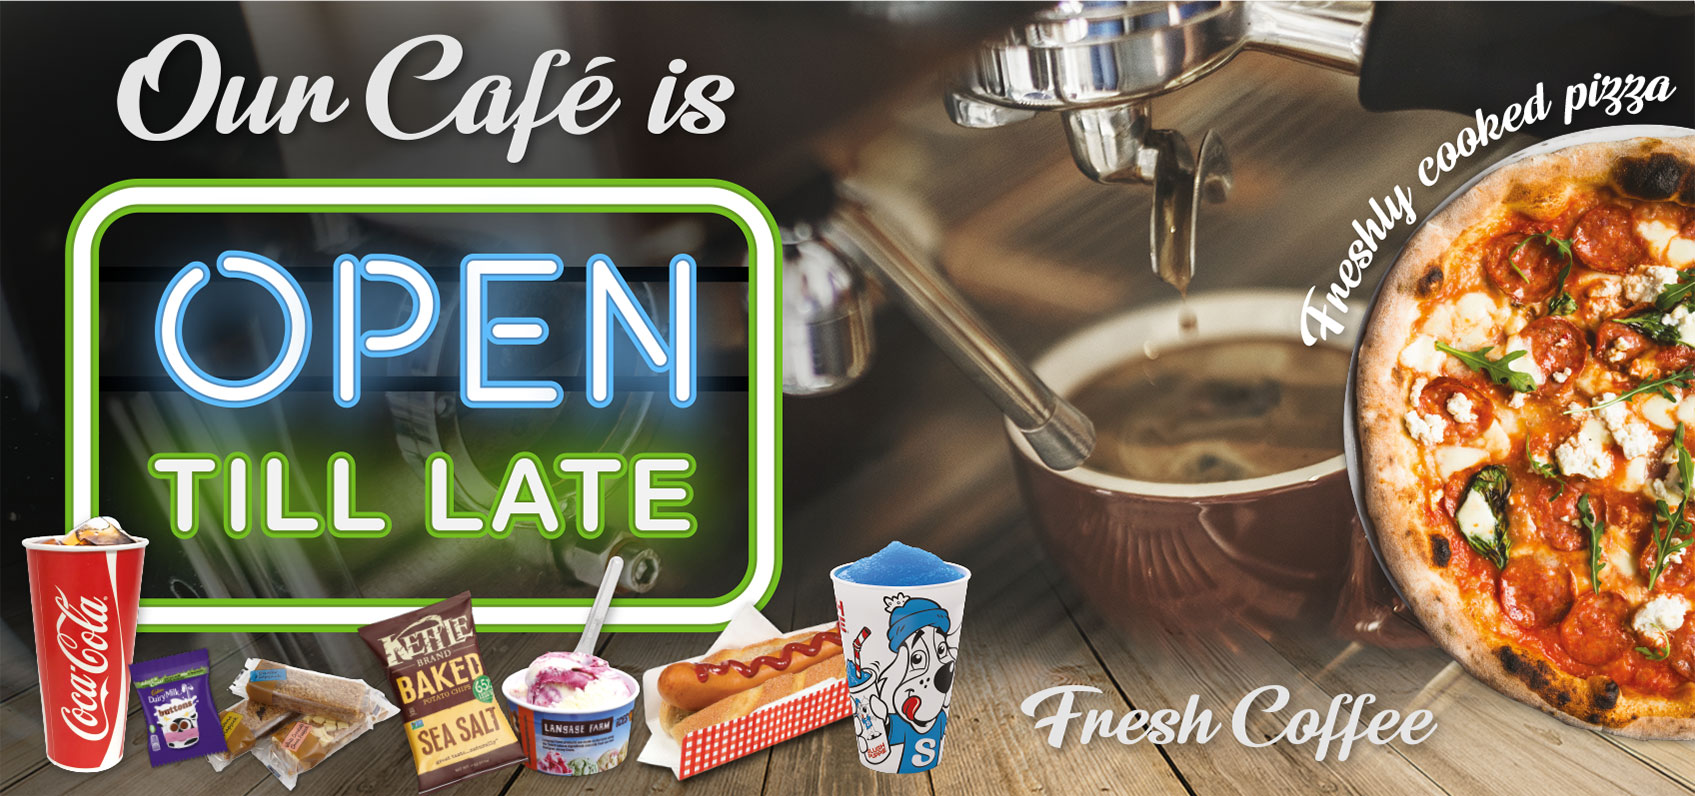 Cafe-open-stp.jpg